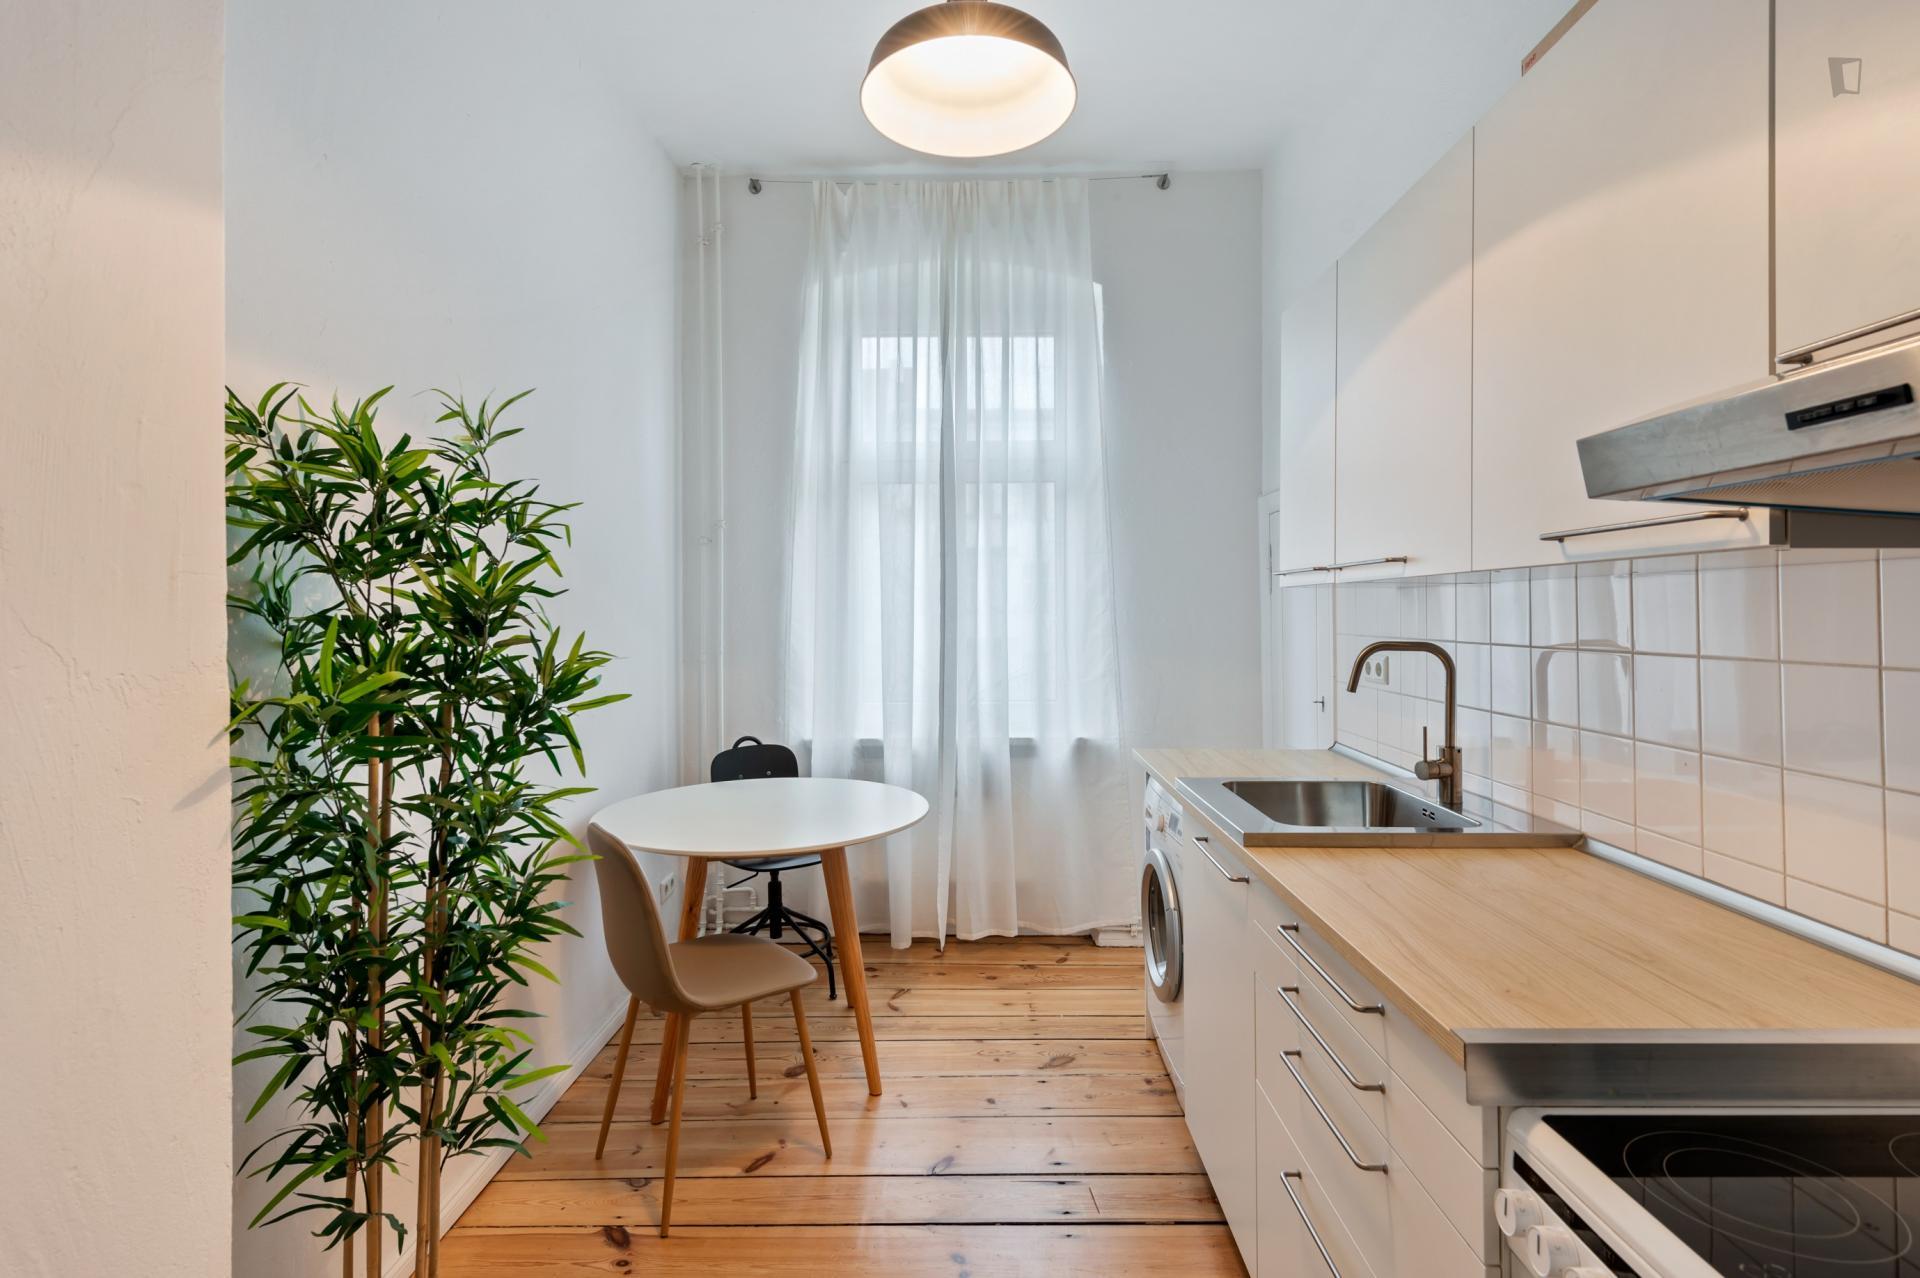 Sonnen - Furnished expat studio in Berlin